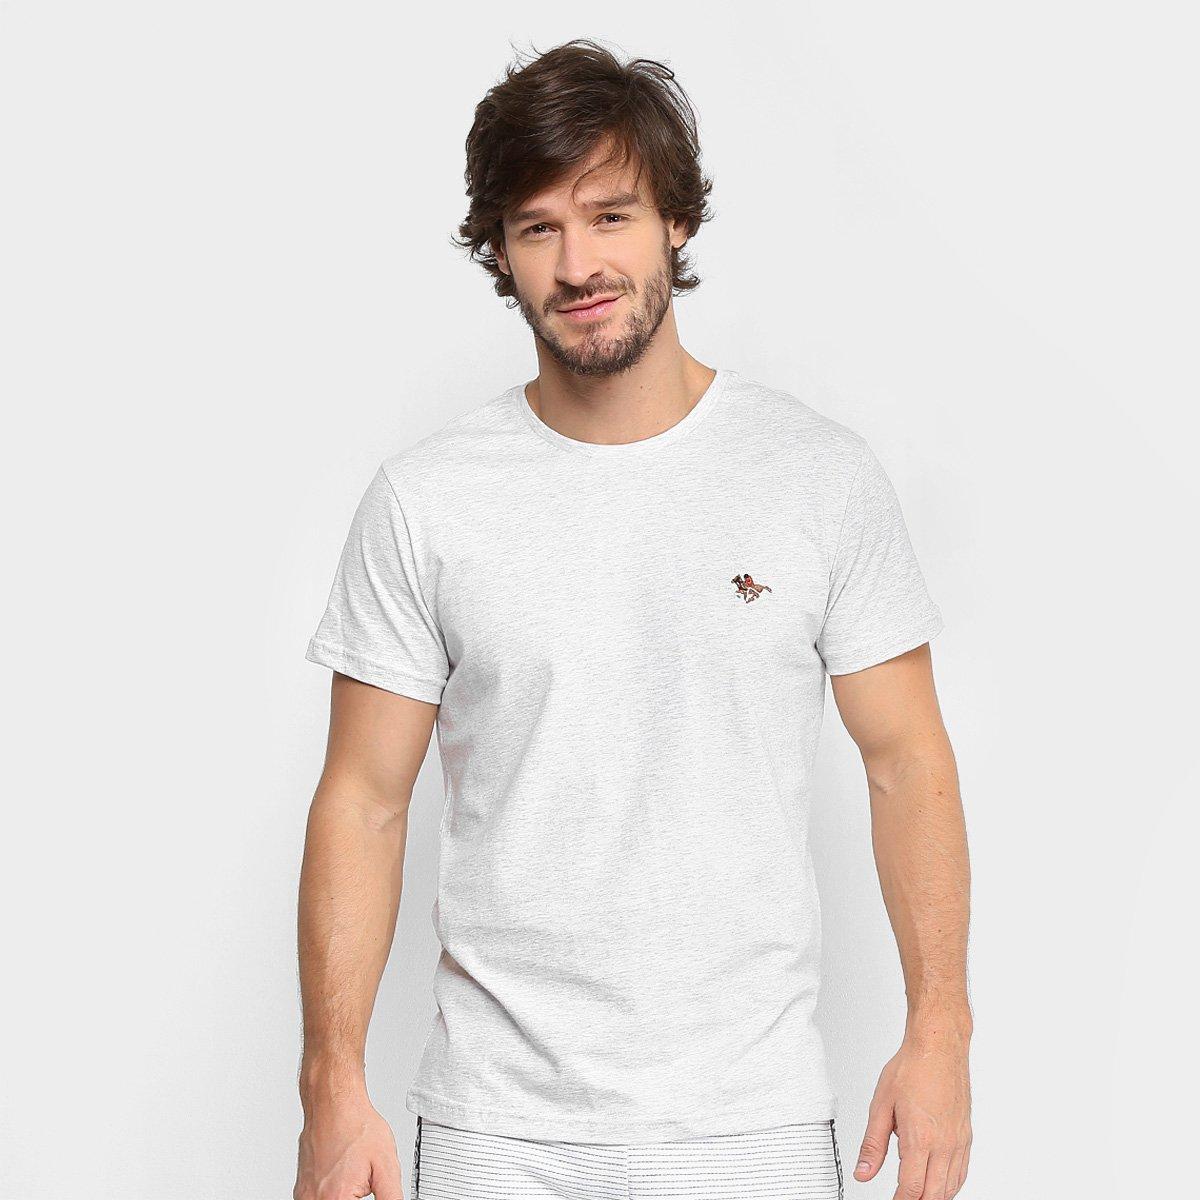 0871a6cfe Camiseta Polo RG 518 Bordado Color Masculina